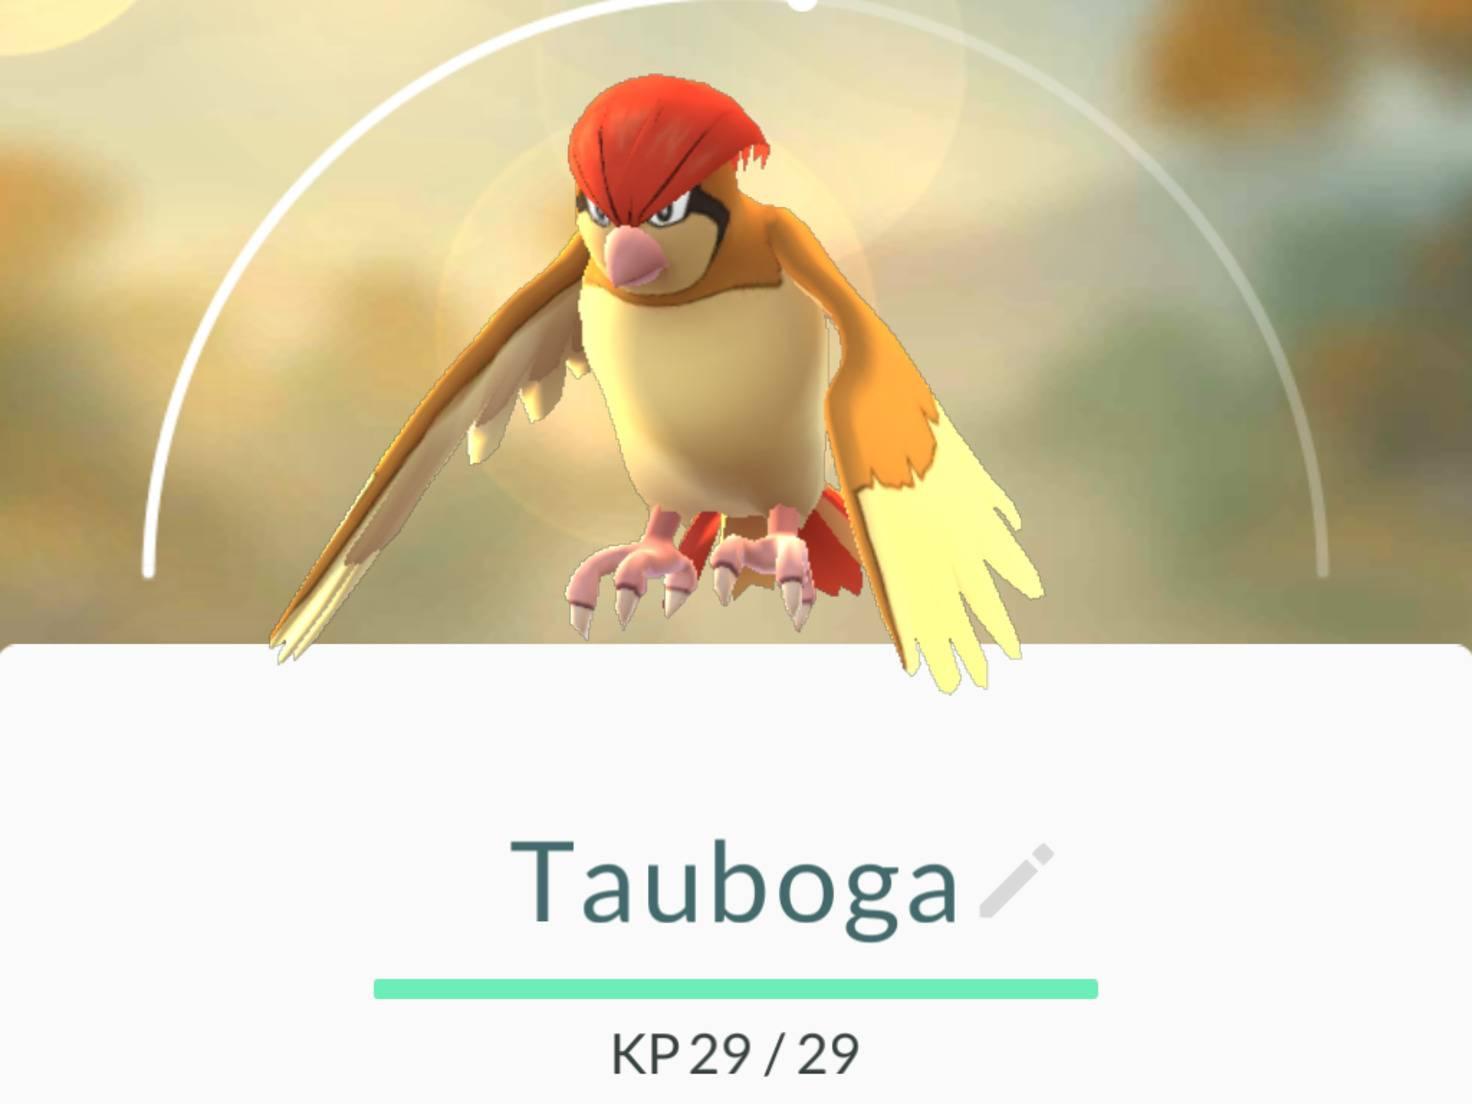 Tauboga_Pokemon